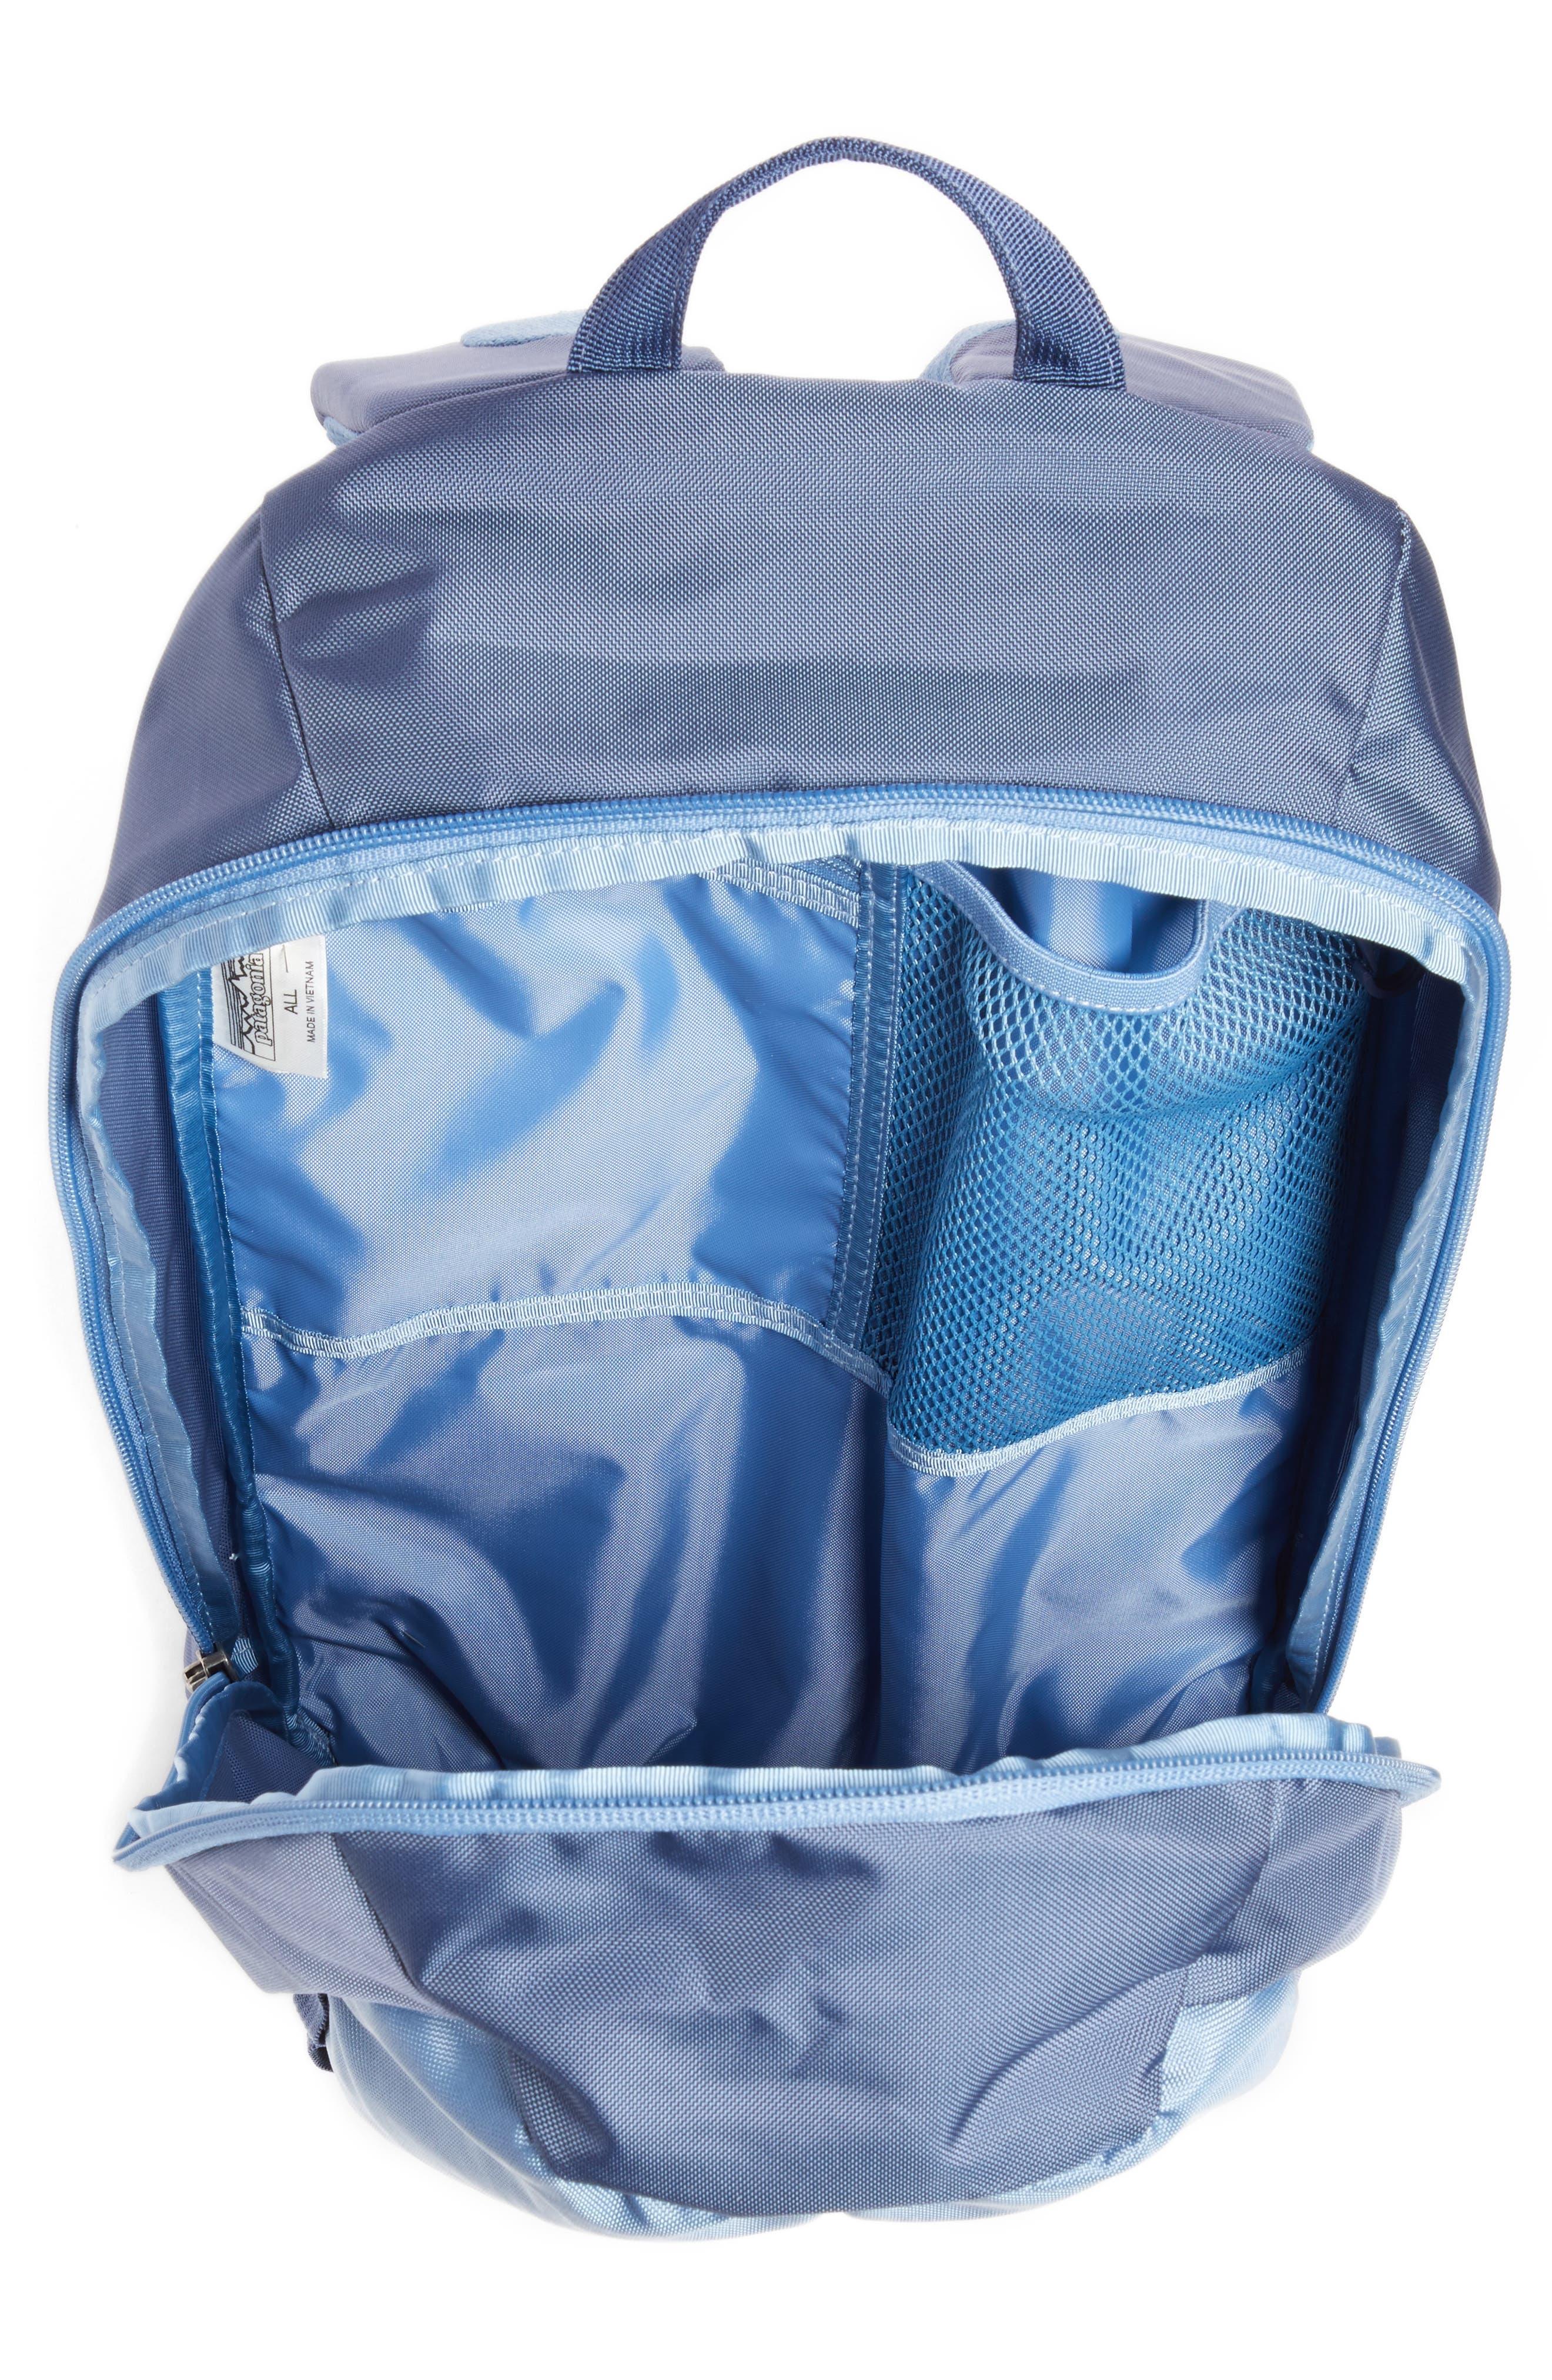 18L Atom Backpack,                             Alternate thumbnail 4, color,                             Dolomite Blue